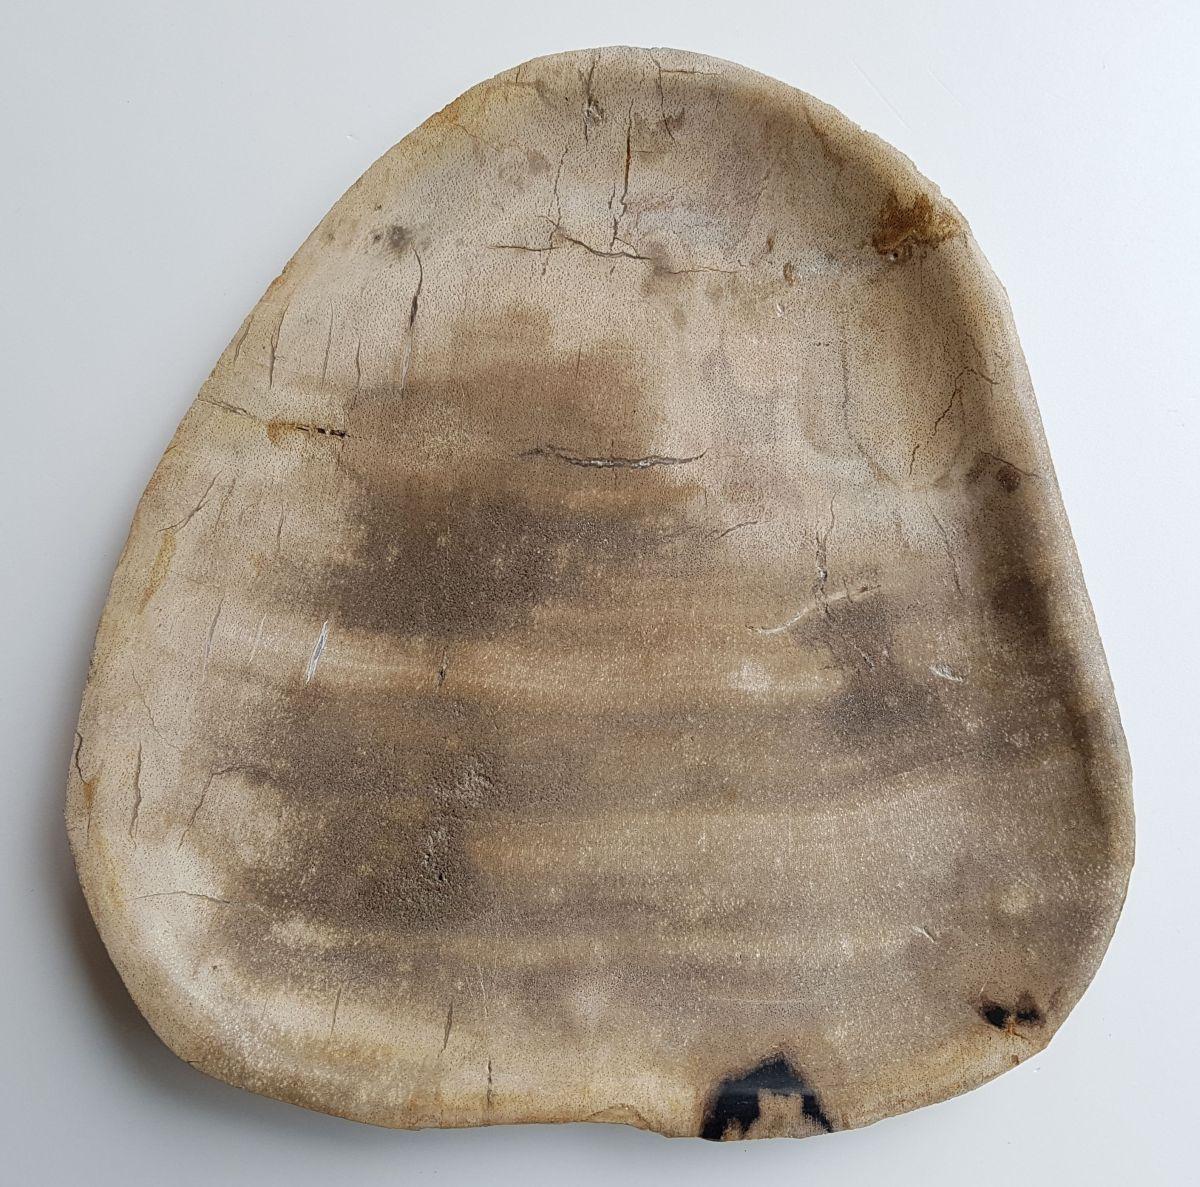 Plate petrified wood 33004f